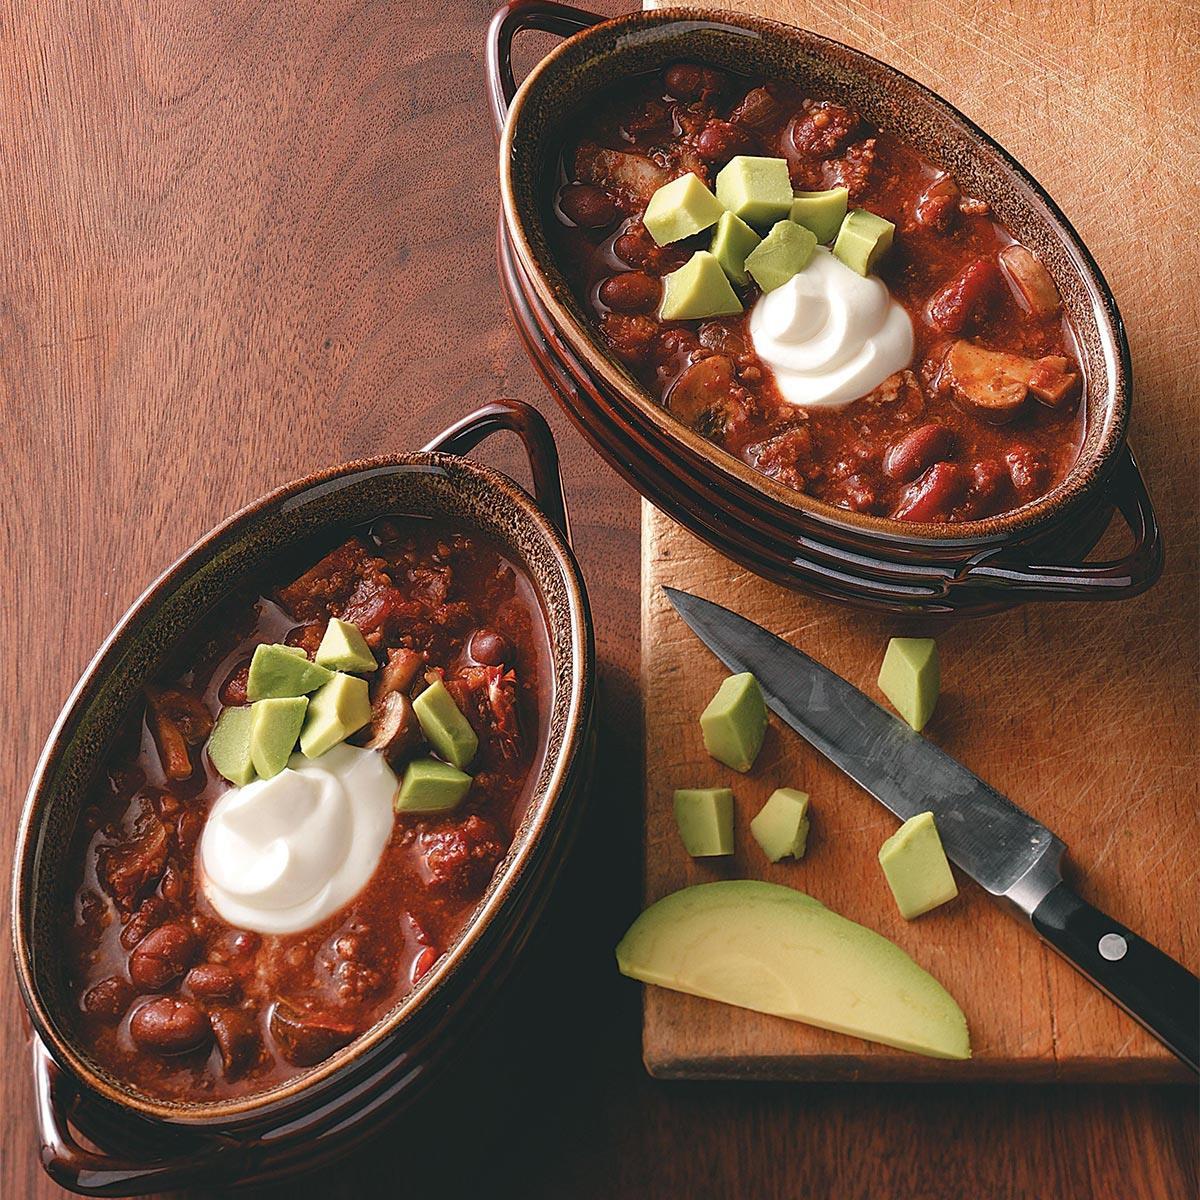 Taste Of Home Vegetarian Chili  Hearty Ve arian Chili Recipe